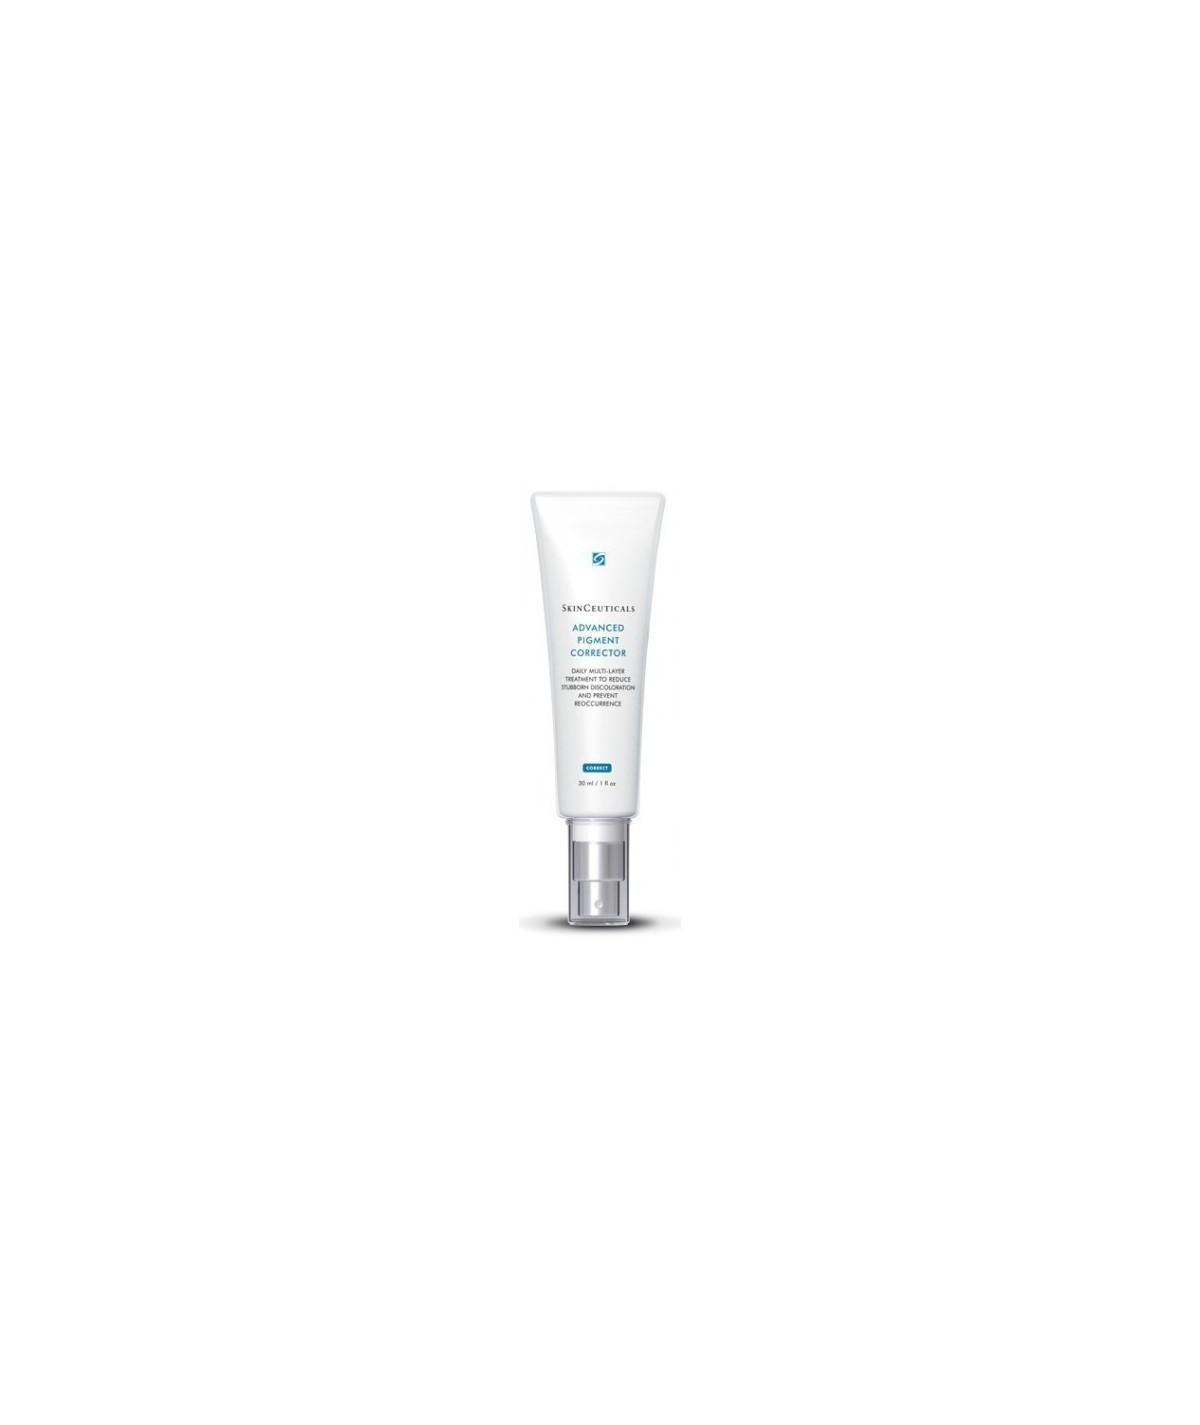 Skinceuticals Crema Advanced Pigment Corrector 30ml